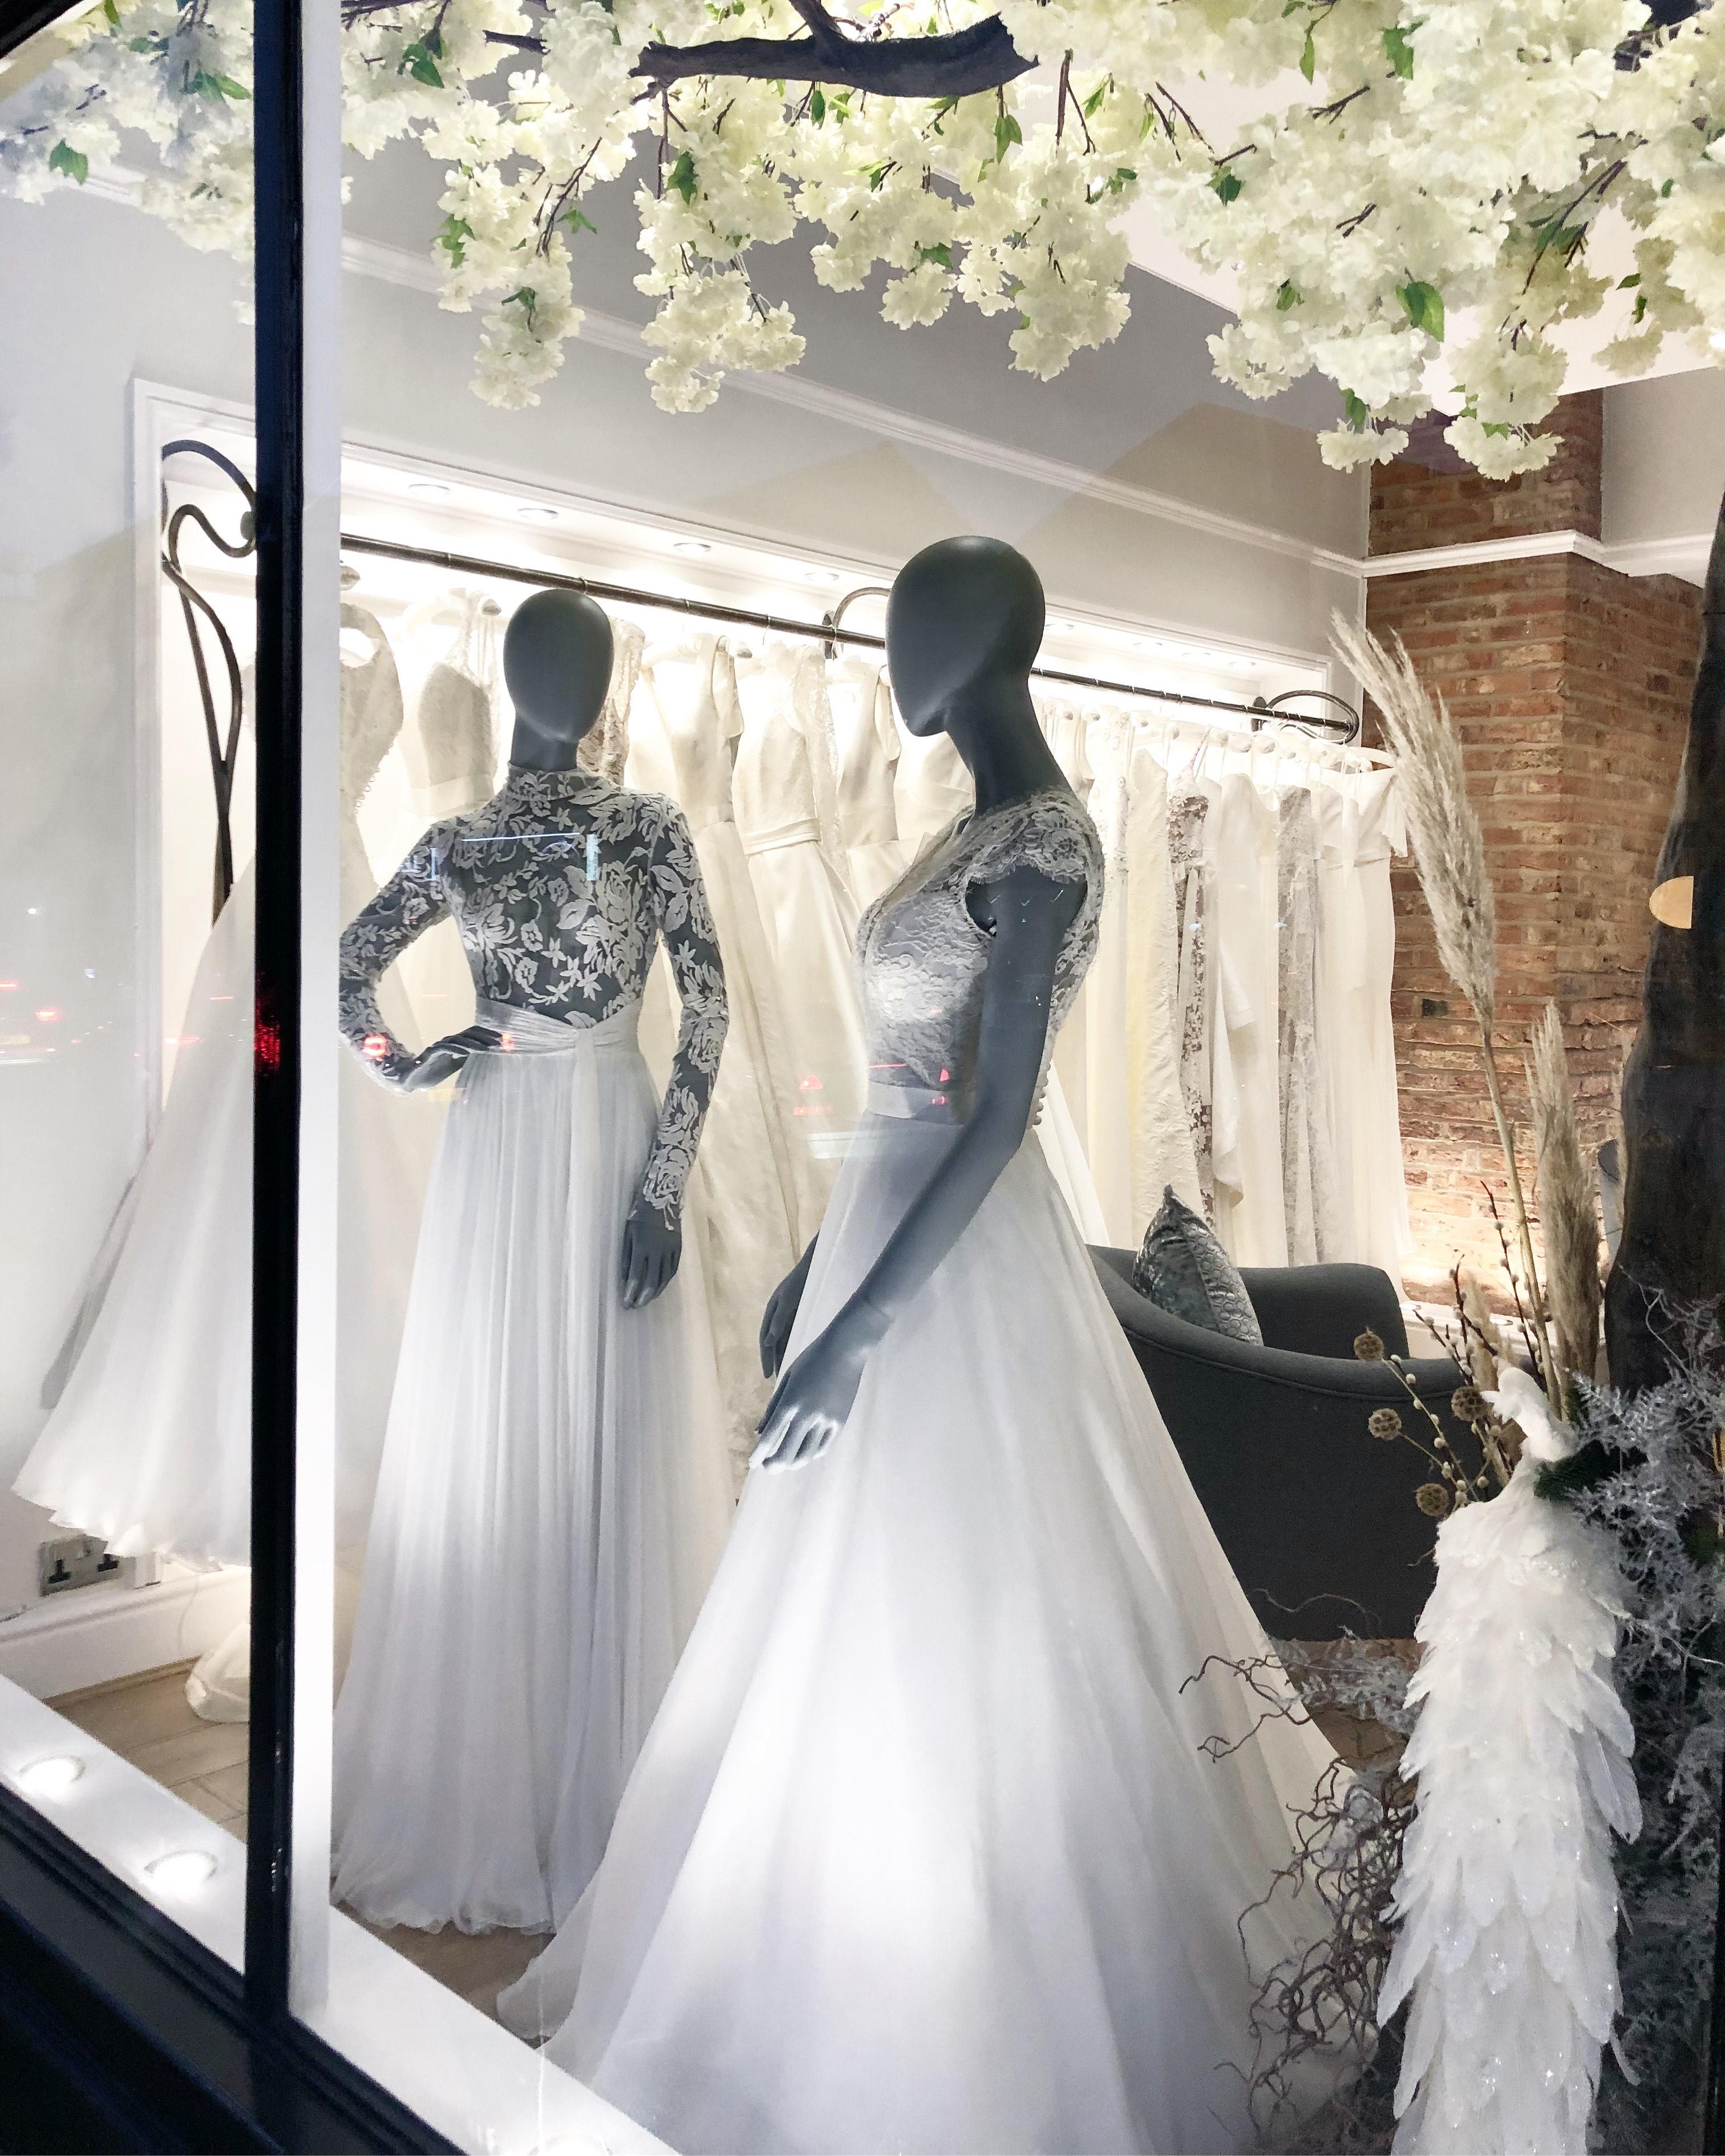 Real Brides Suzanne Neville: Altrincham Cheshire Near